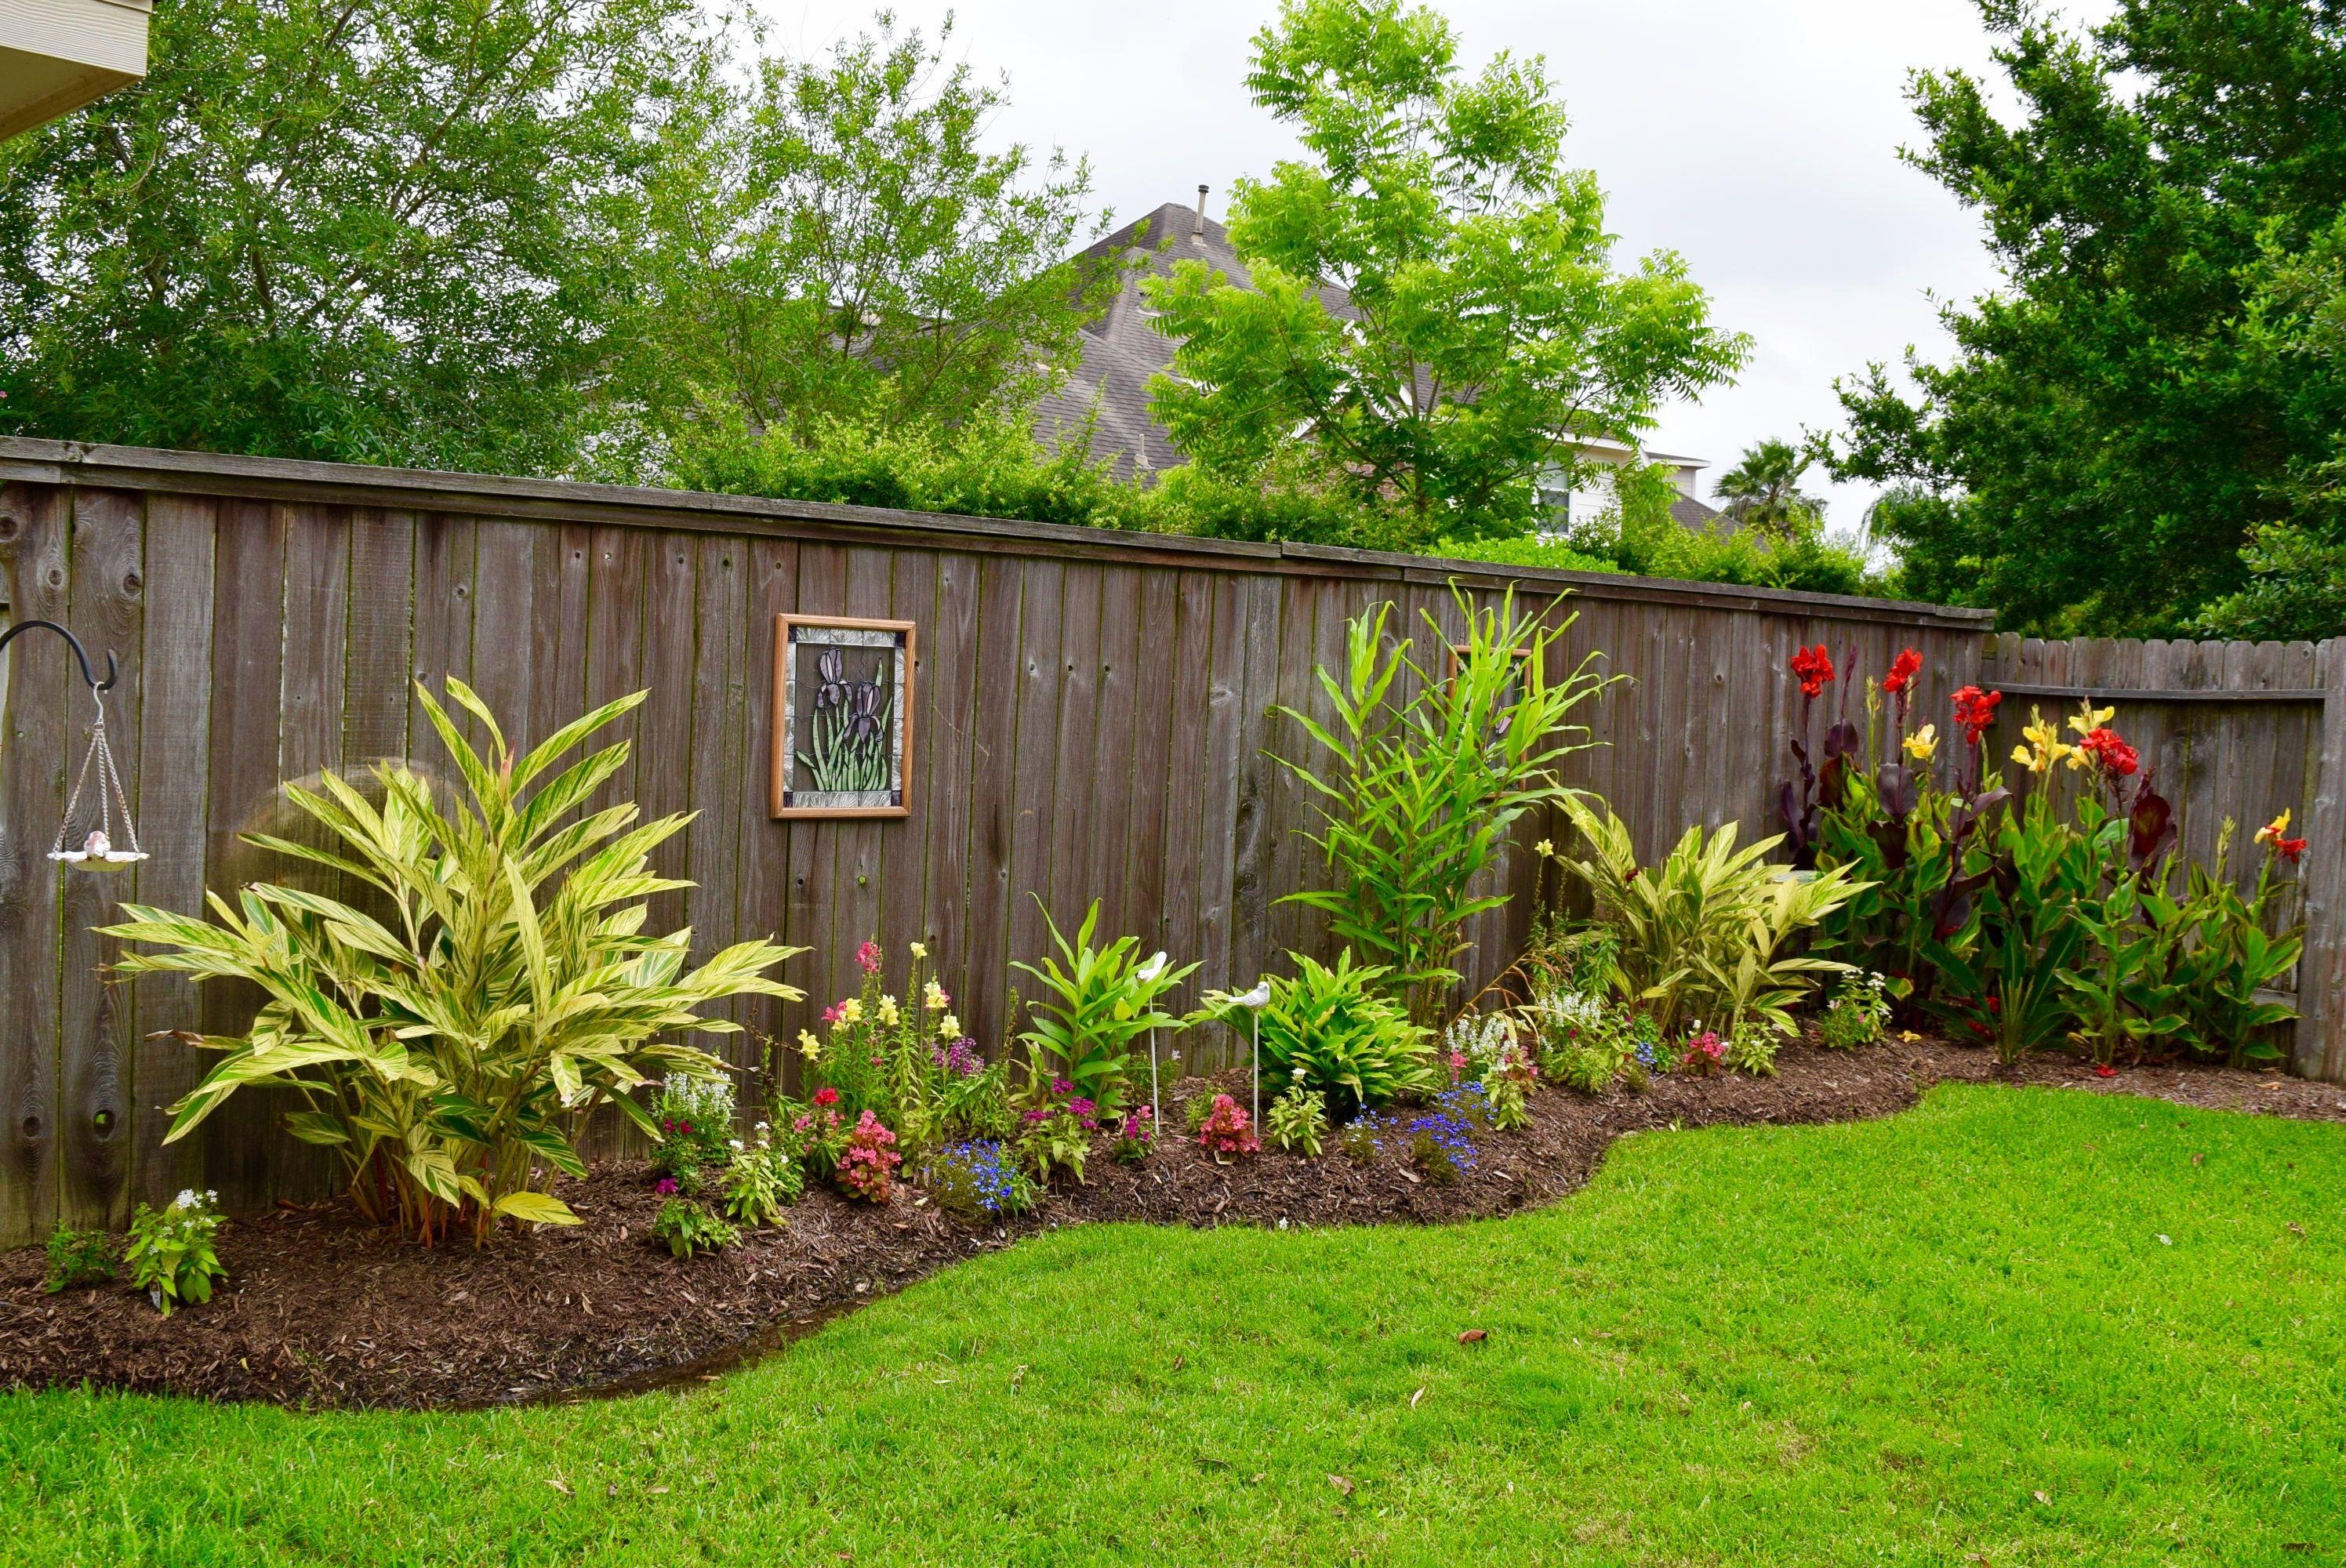 Pin On Decoracion Jardin Backyard landscaping along a fence